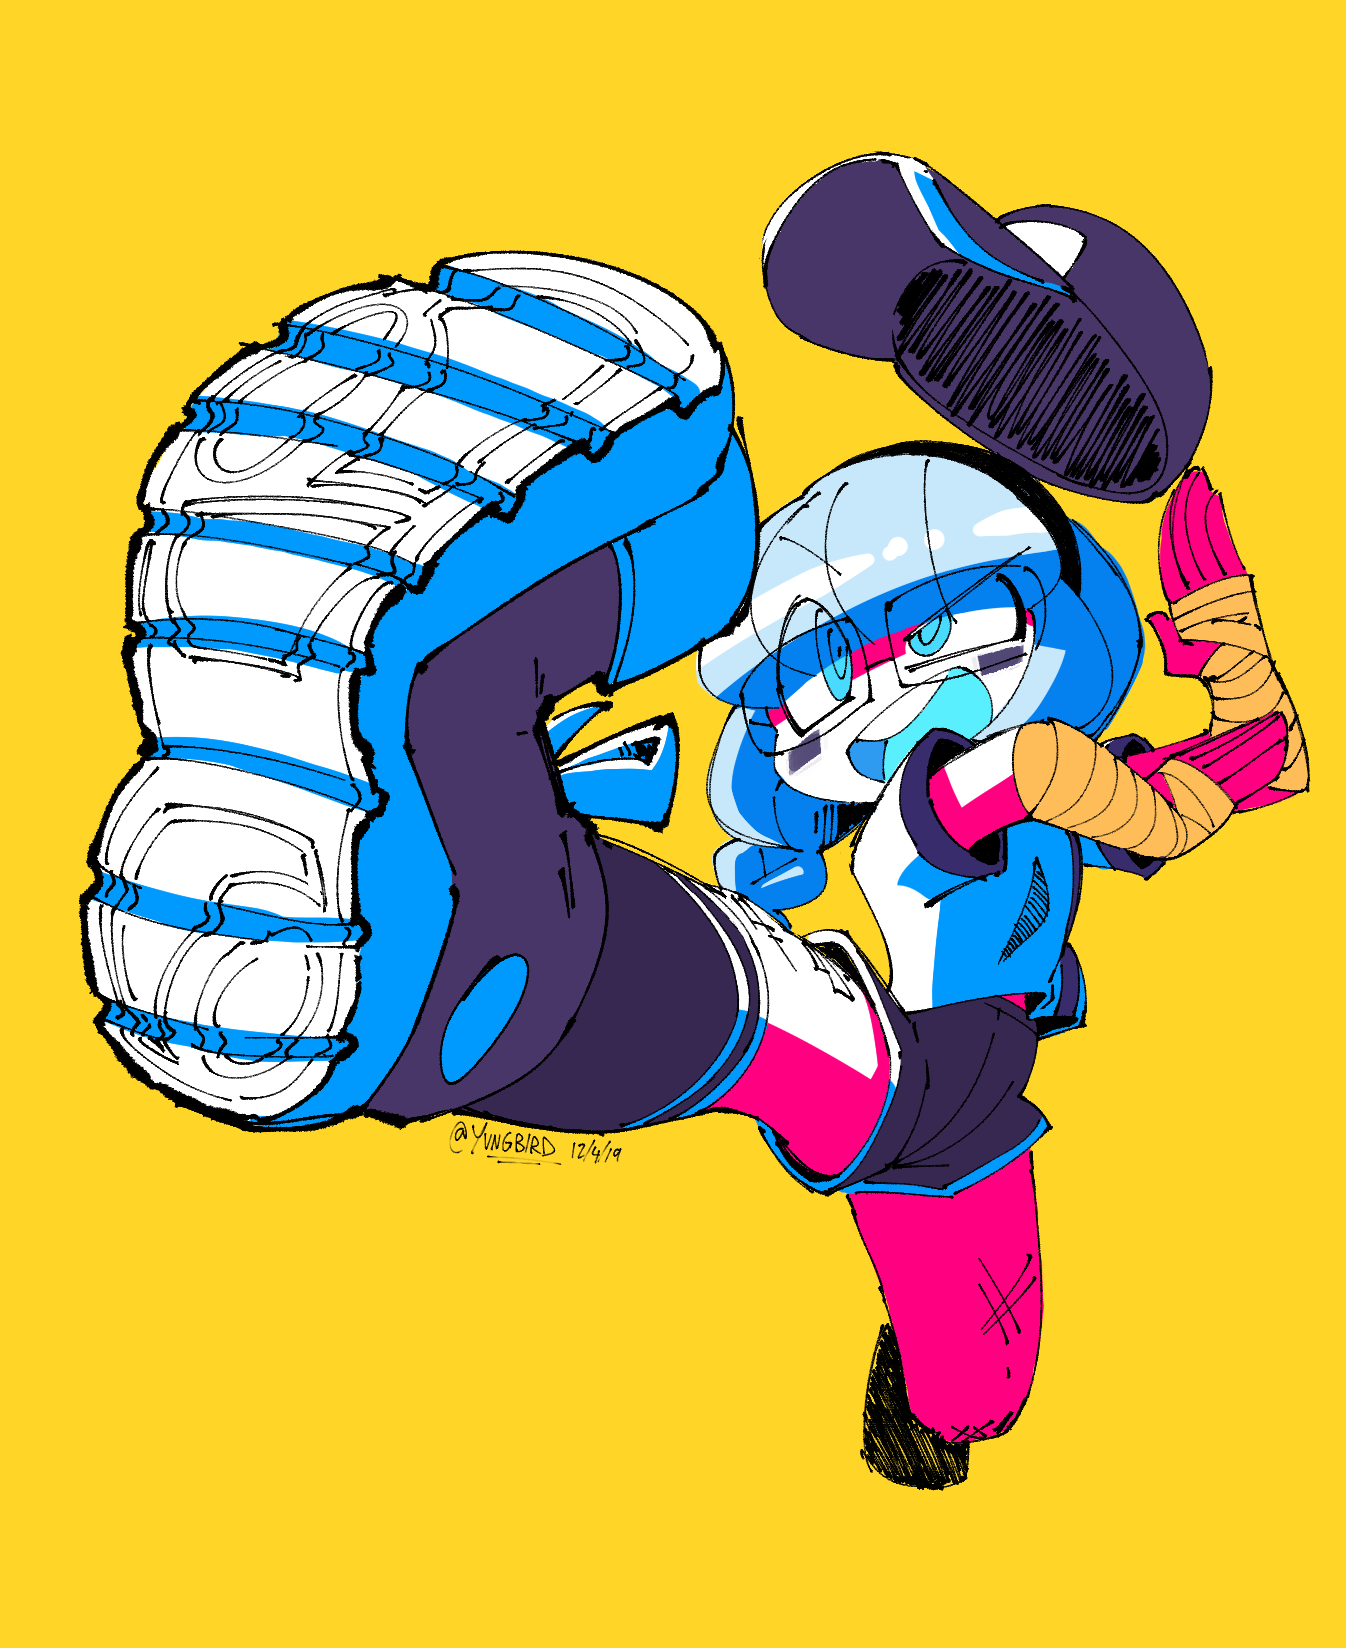 power kick!!